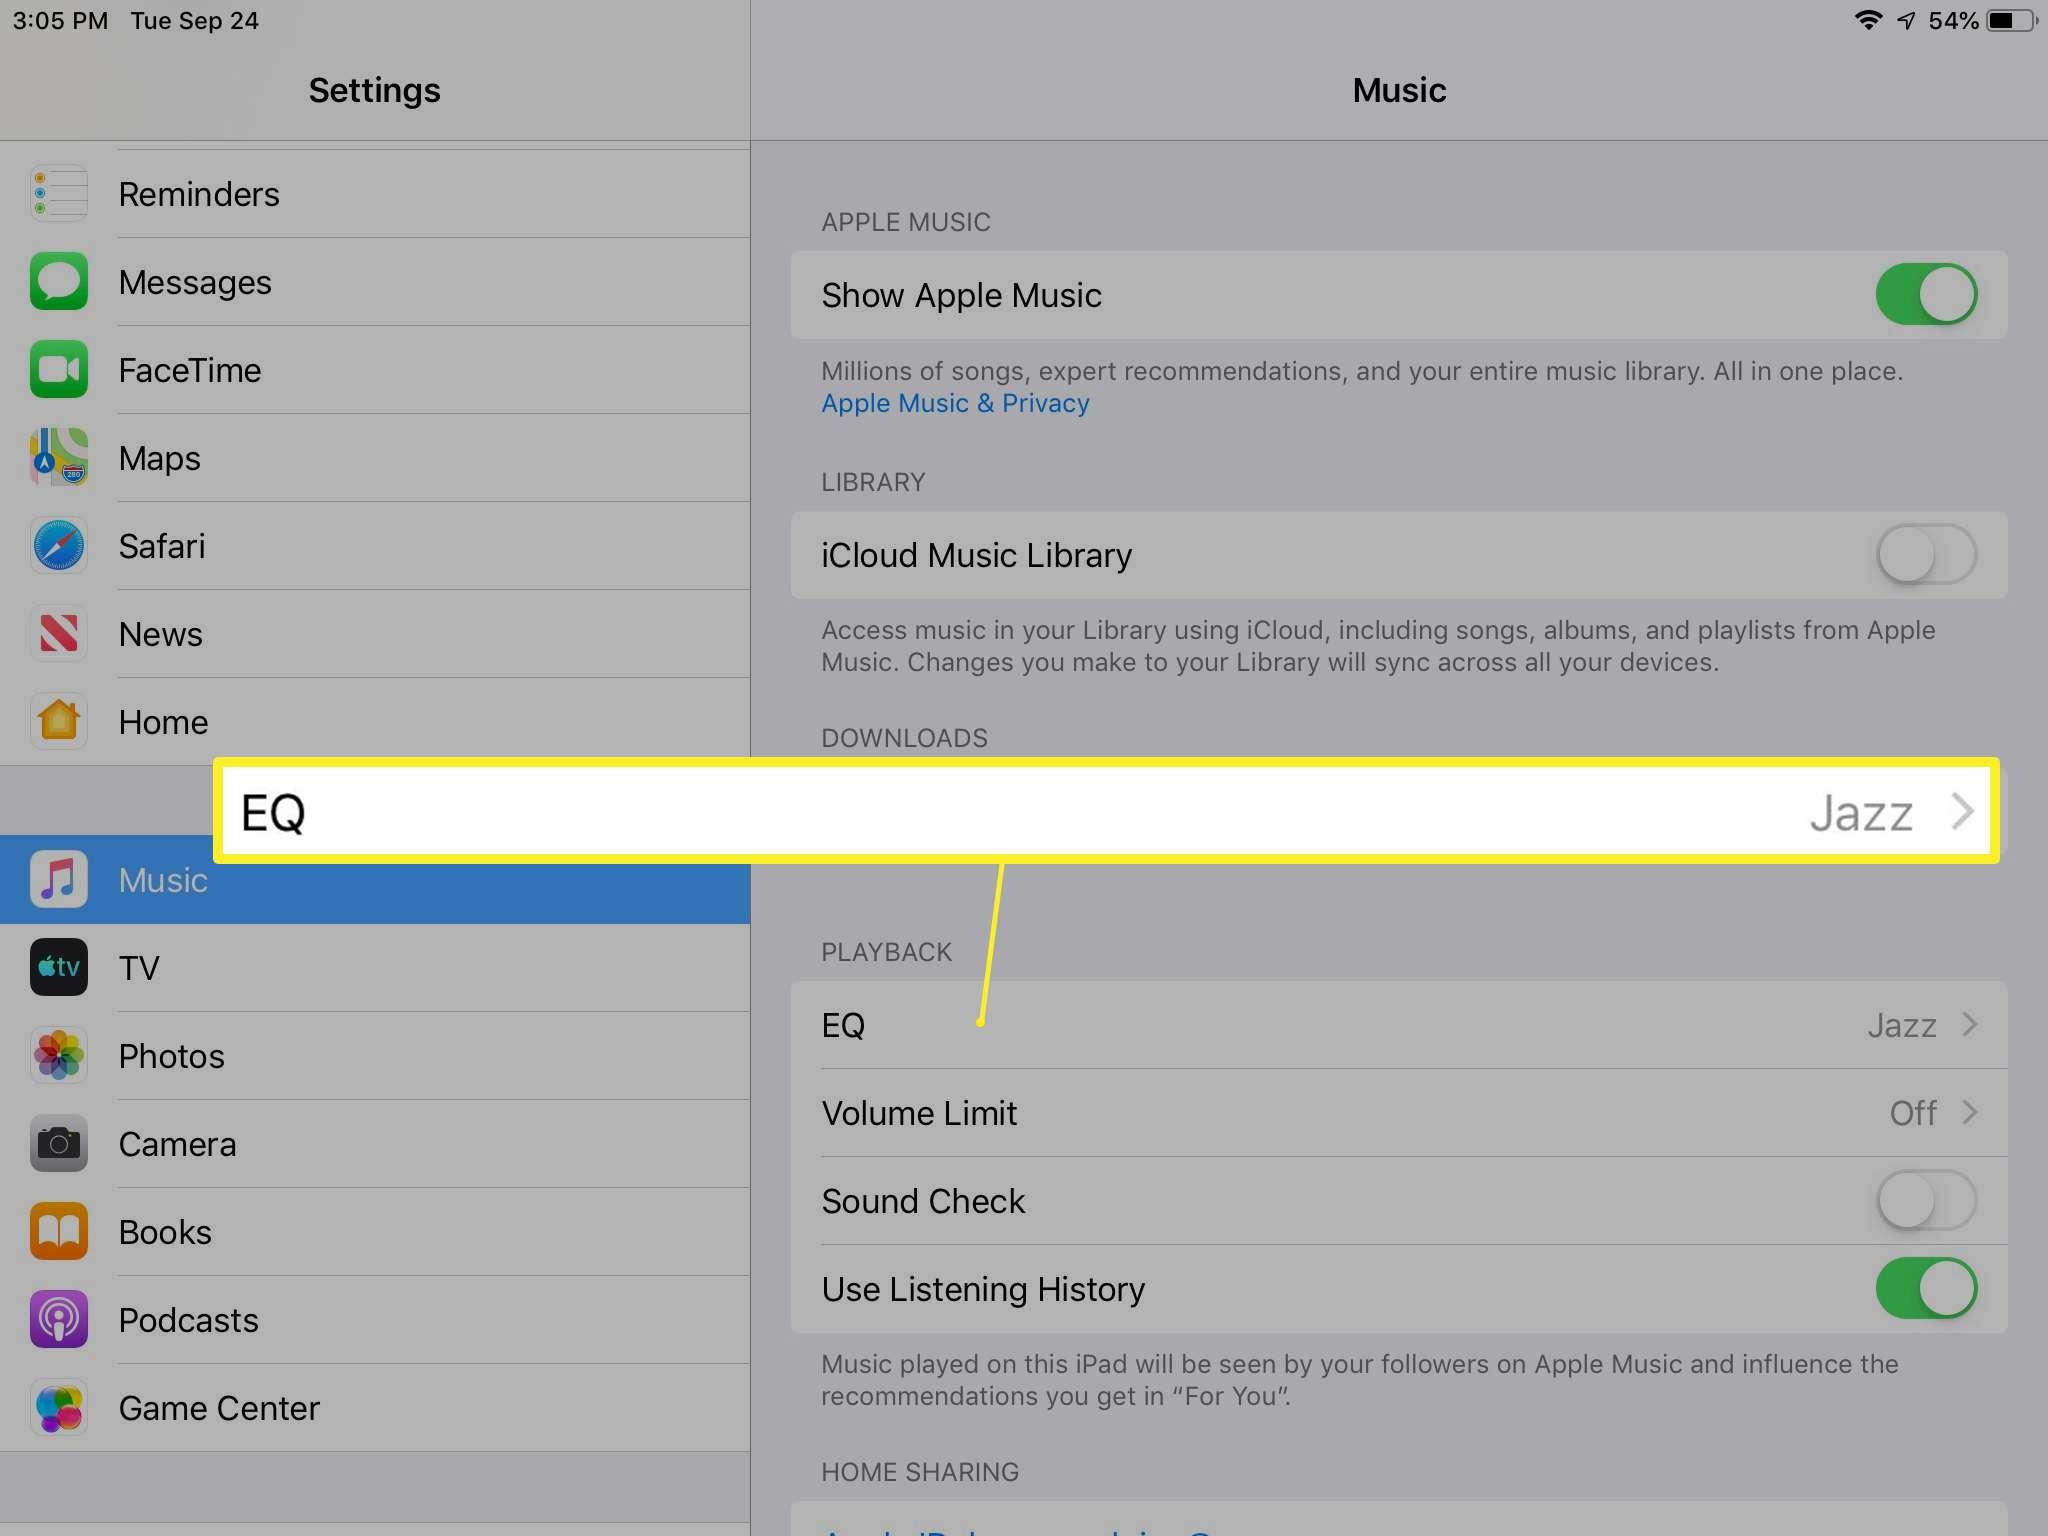 EQ setting on iPad